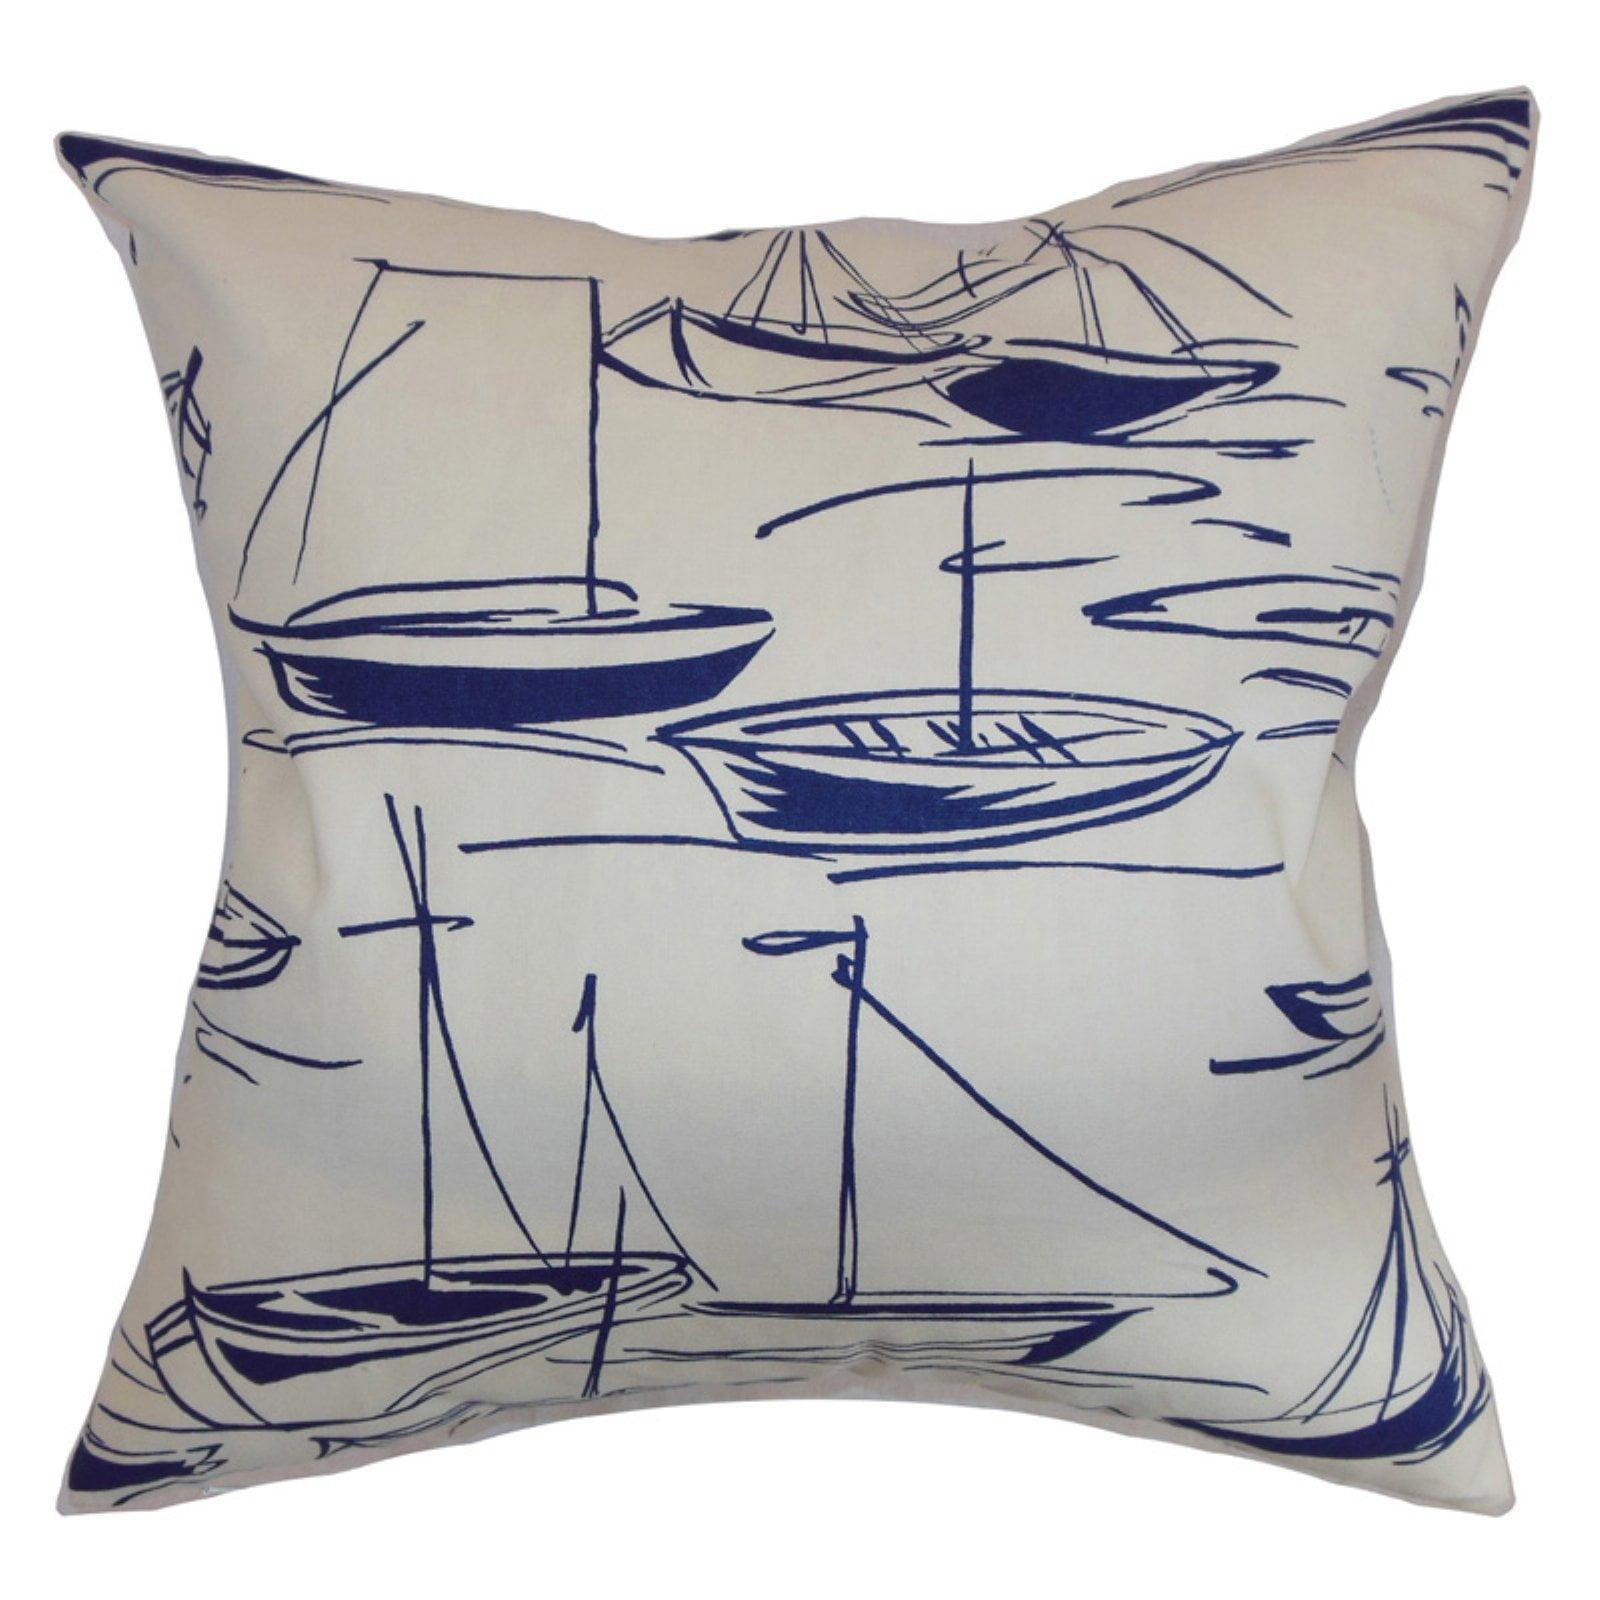 The Pillow Collection Gamboola Nautical Pillow - Navy